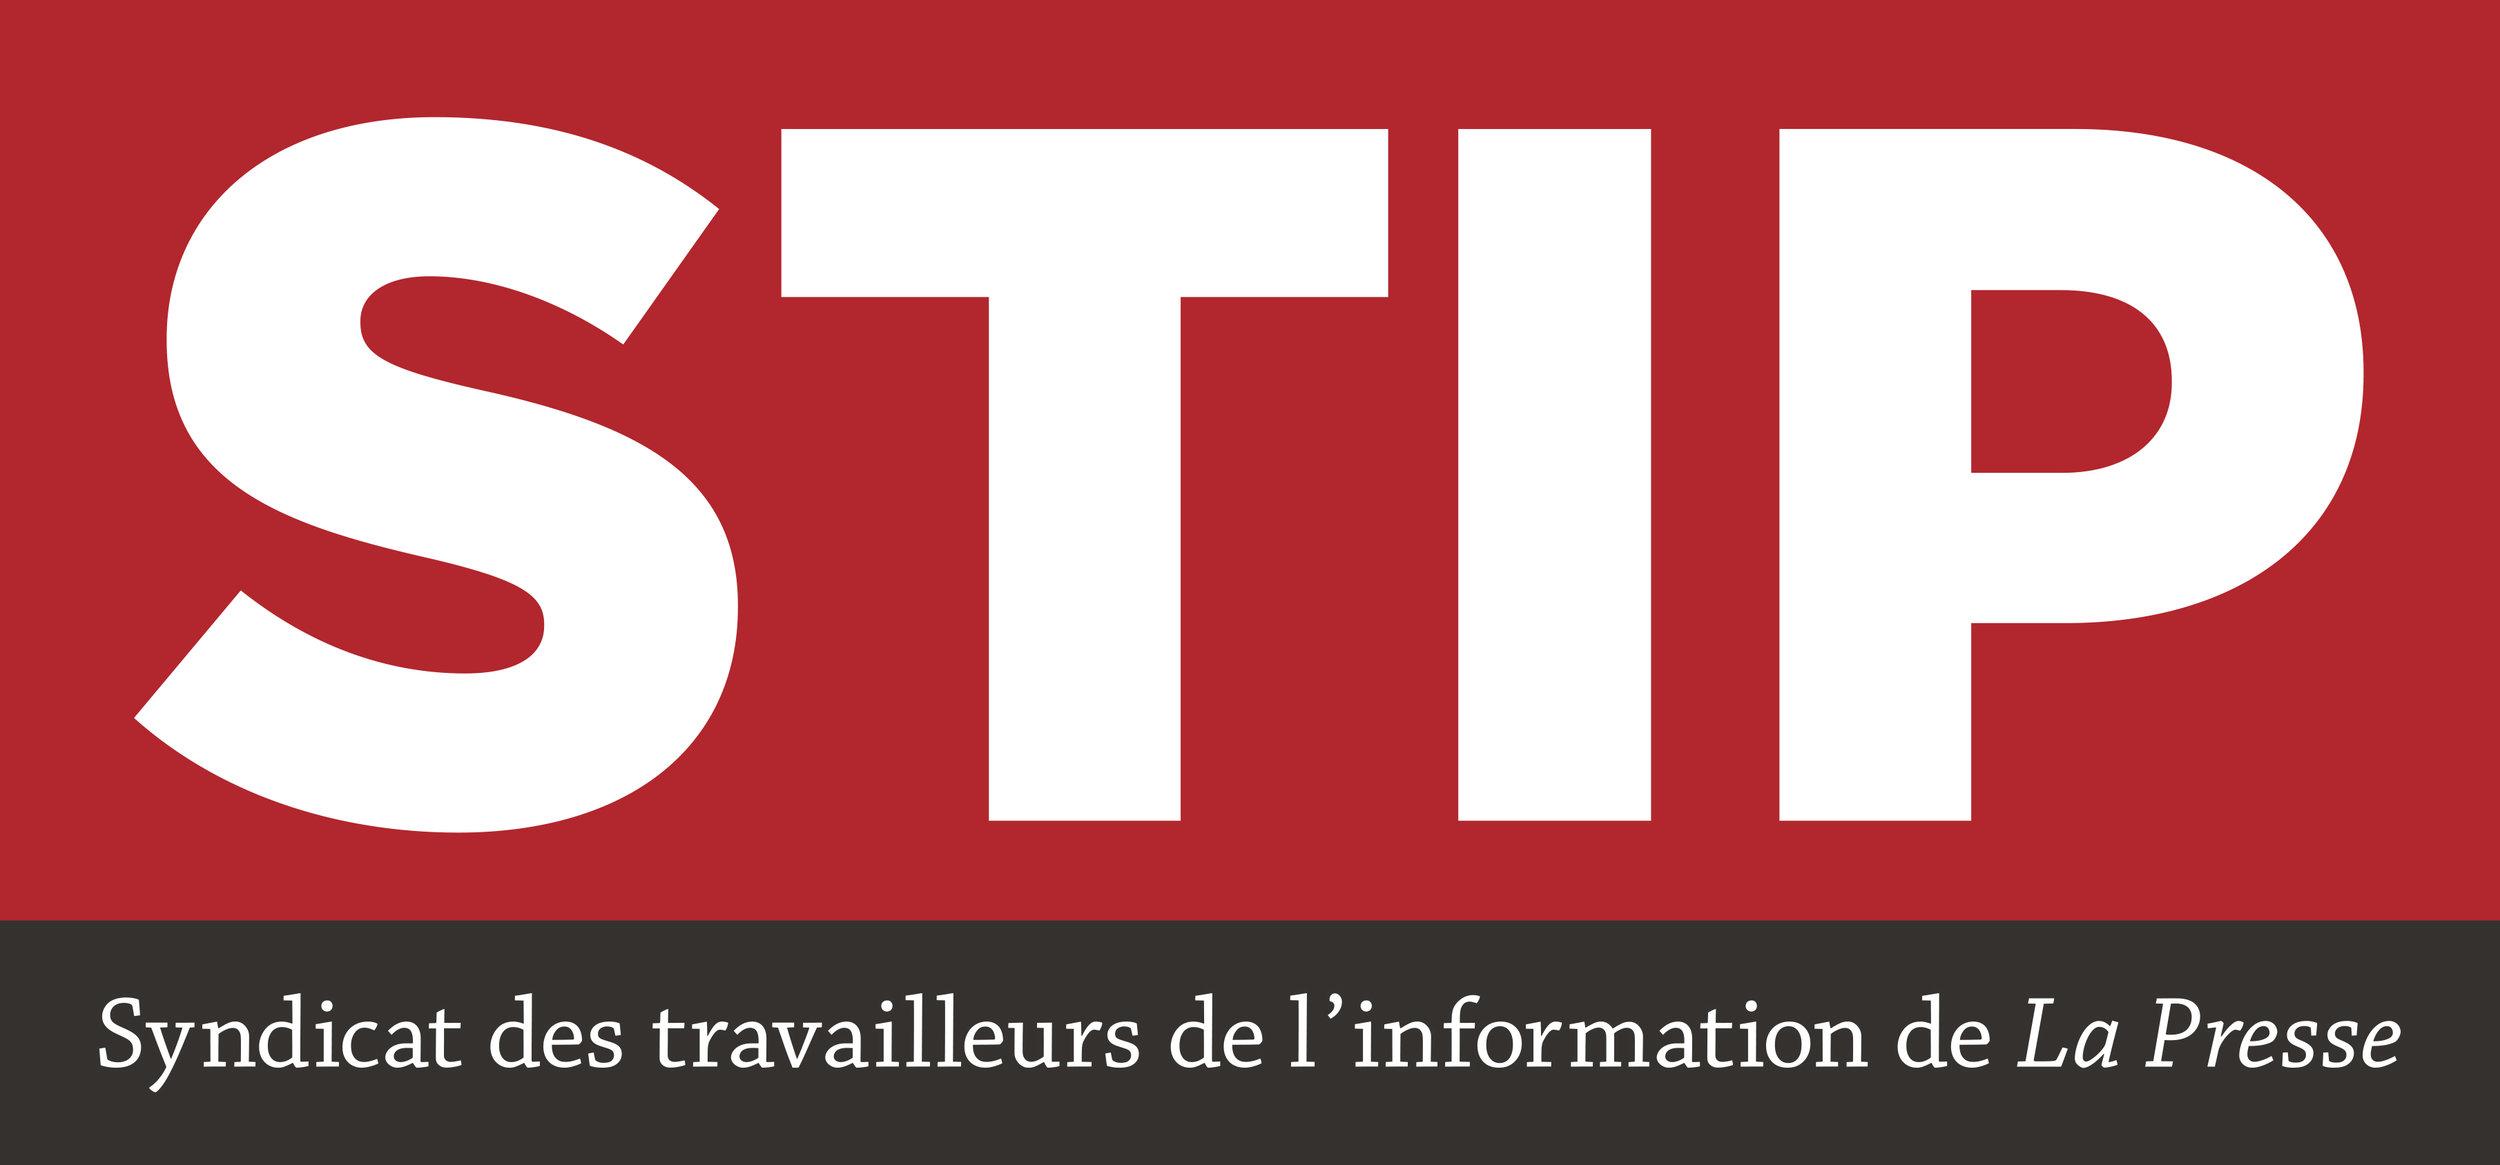 Logo STIP high res.jpg